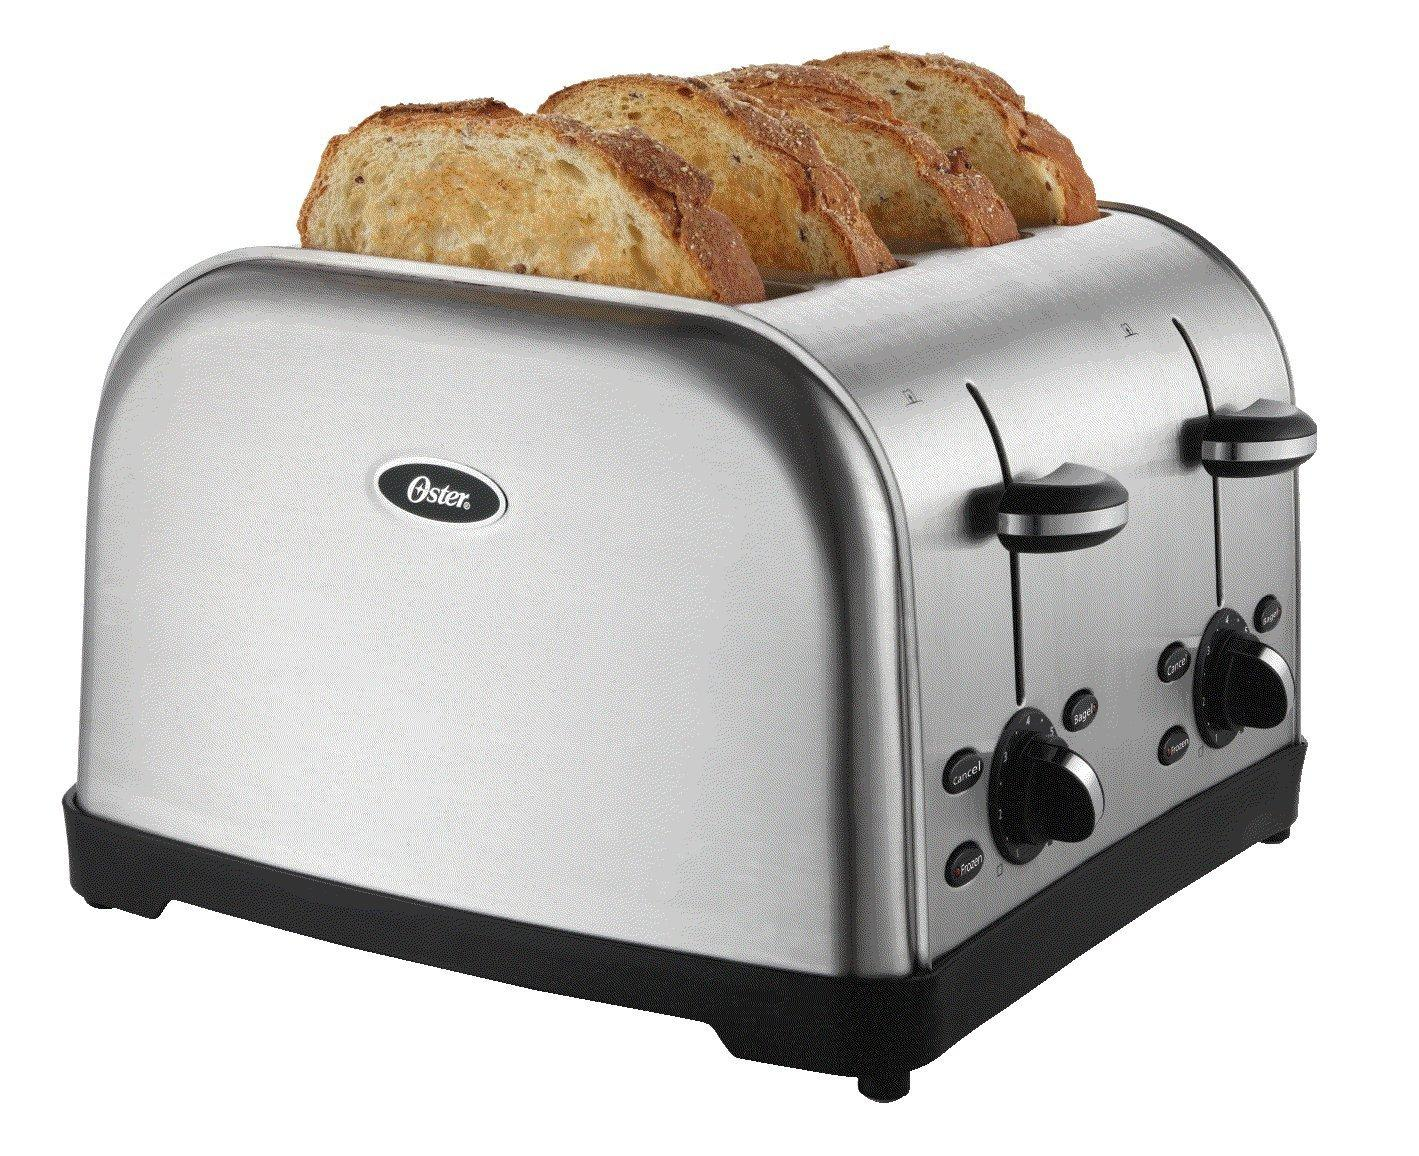 Amazon.com: Oster TSSTTRWF4S 4-Slice Toaster: Kitchen & Dining